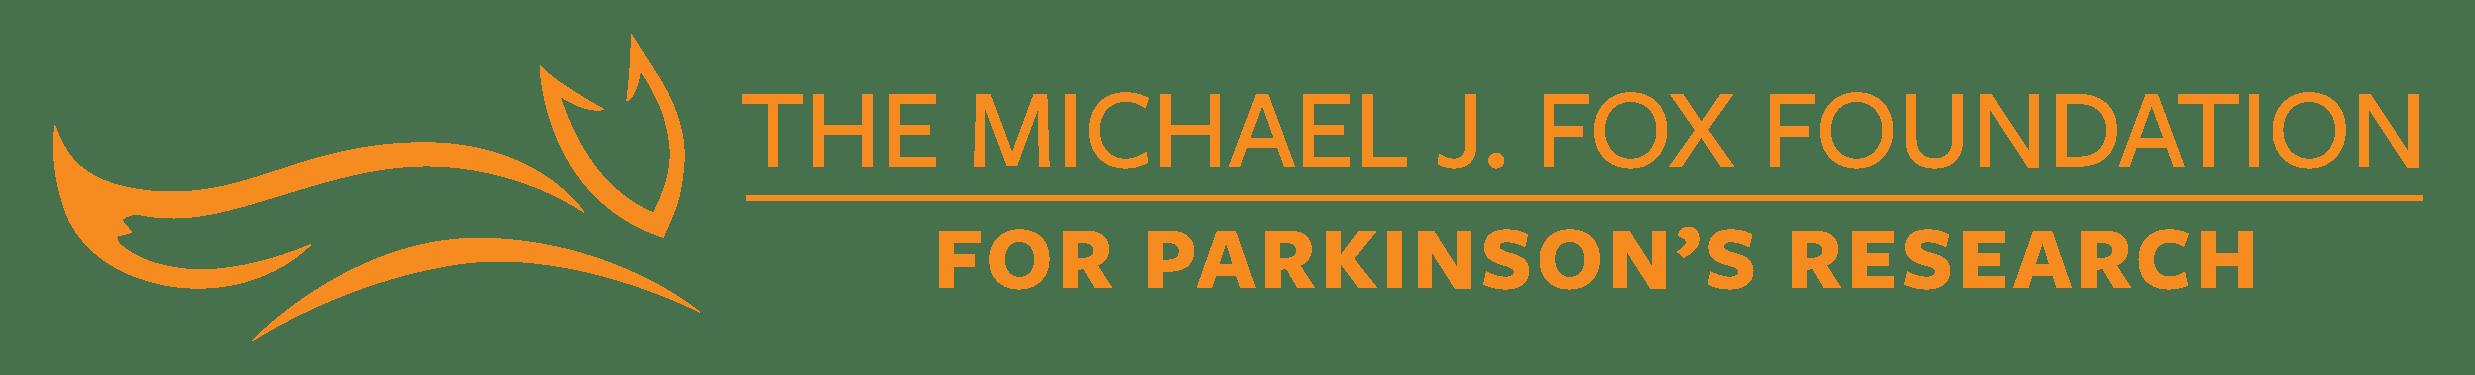 The Michael J. Fox Foundation logo